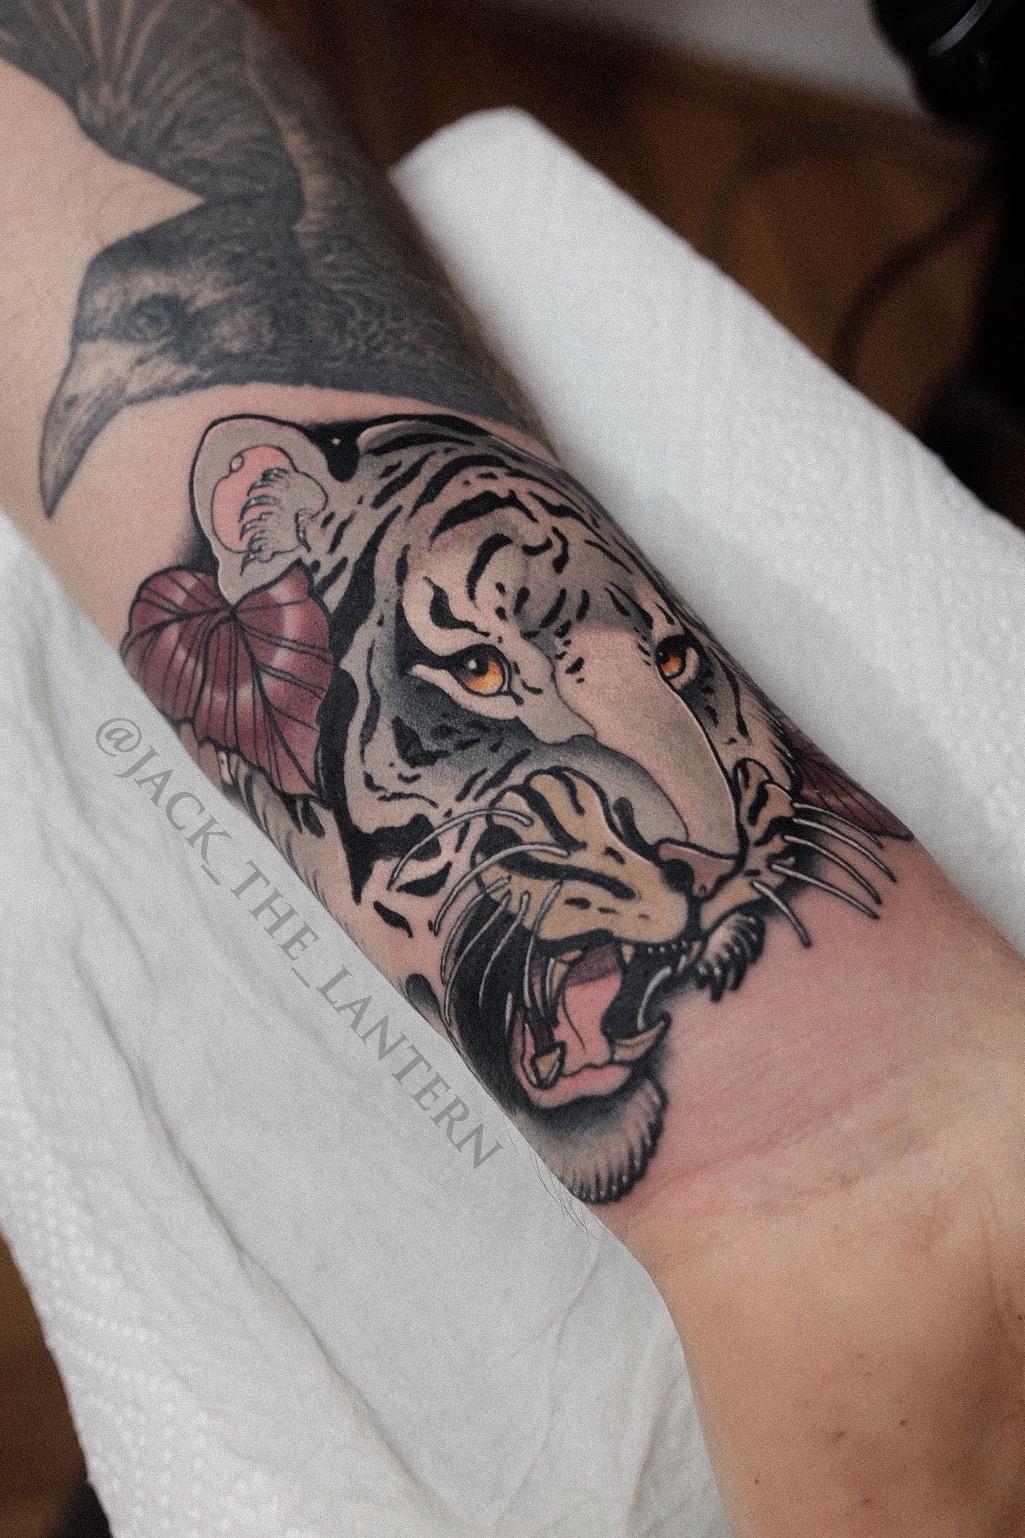 Inksearch tattoo Jack the Lantern